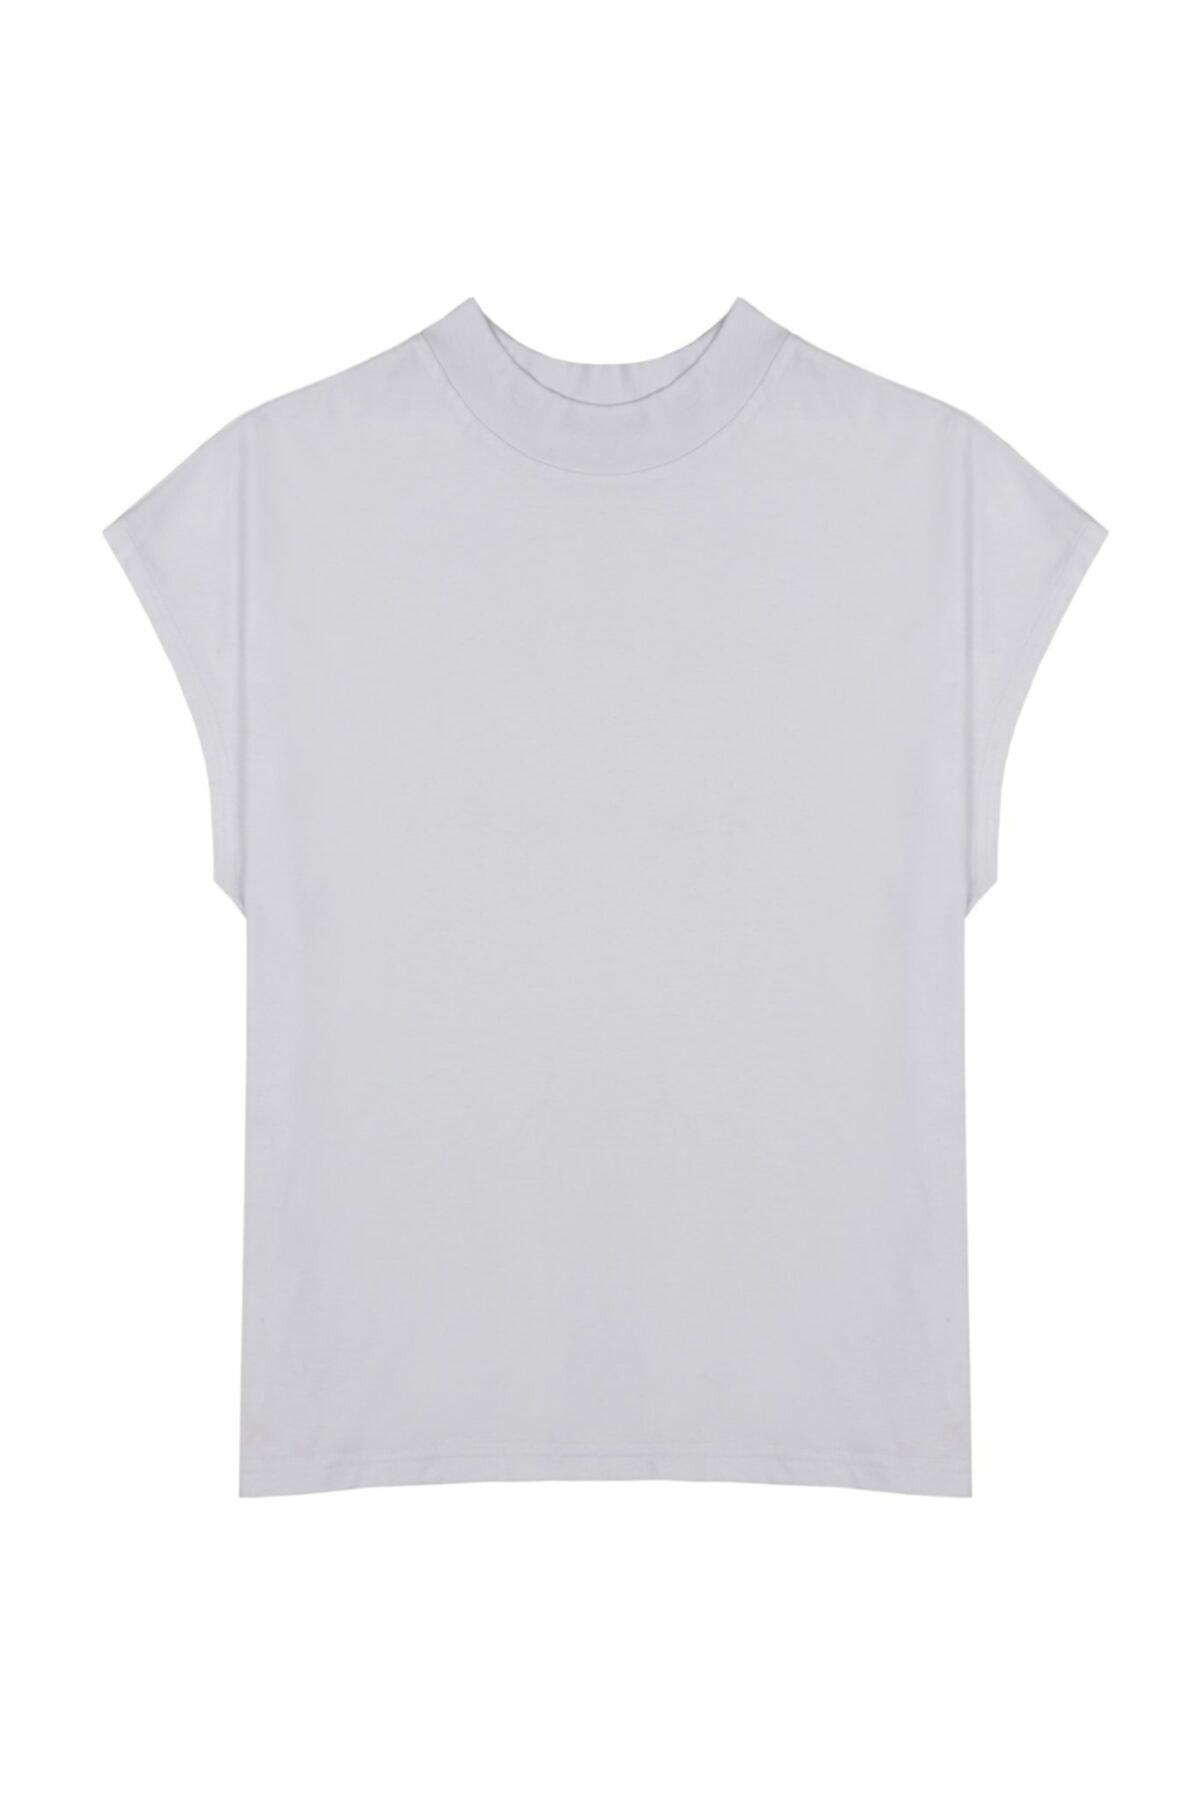 Cate Dik Yaka (Mock Neck) Basic Beyaz T-shirt